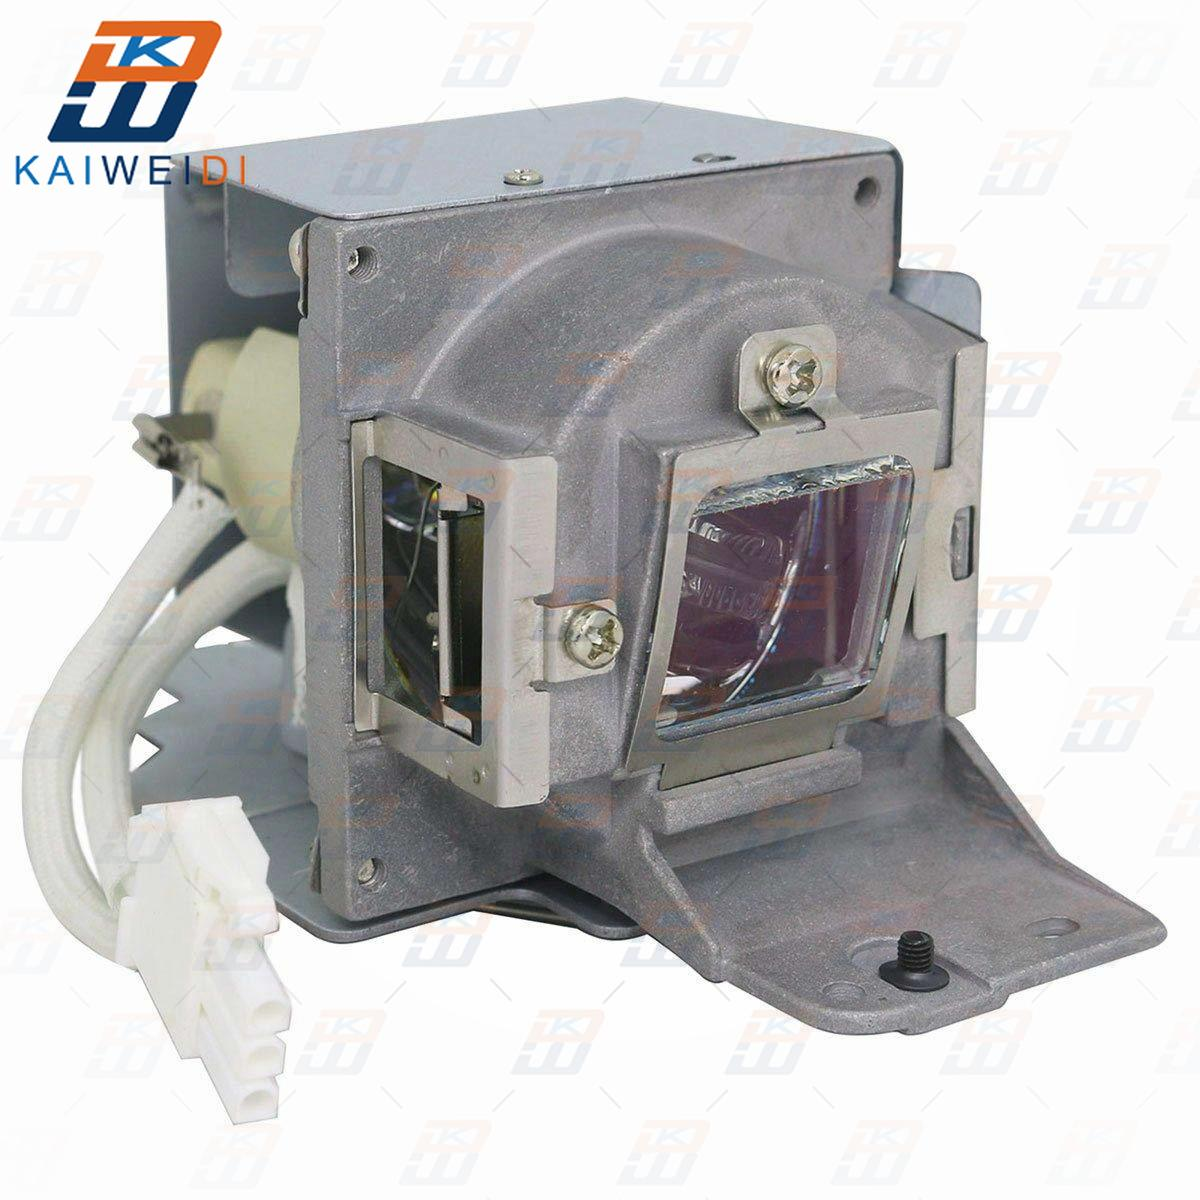 5J.J6D05.001 UHP 190/160W Bulbs Projector Lamp For BENQ MS502 / MS502+ / MS502P / MX503 / MX503+ / MX503P Projectors